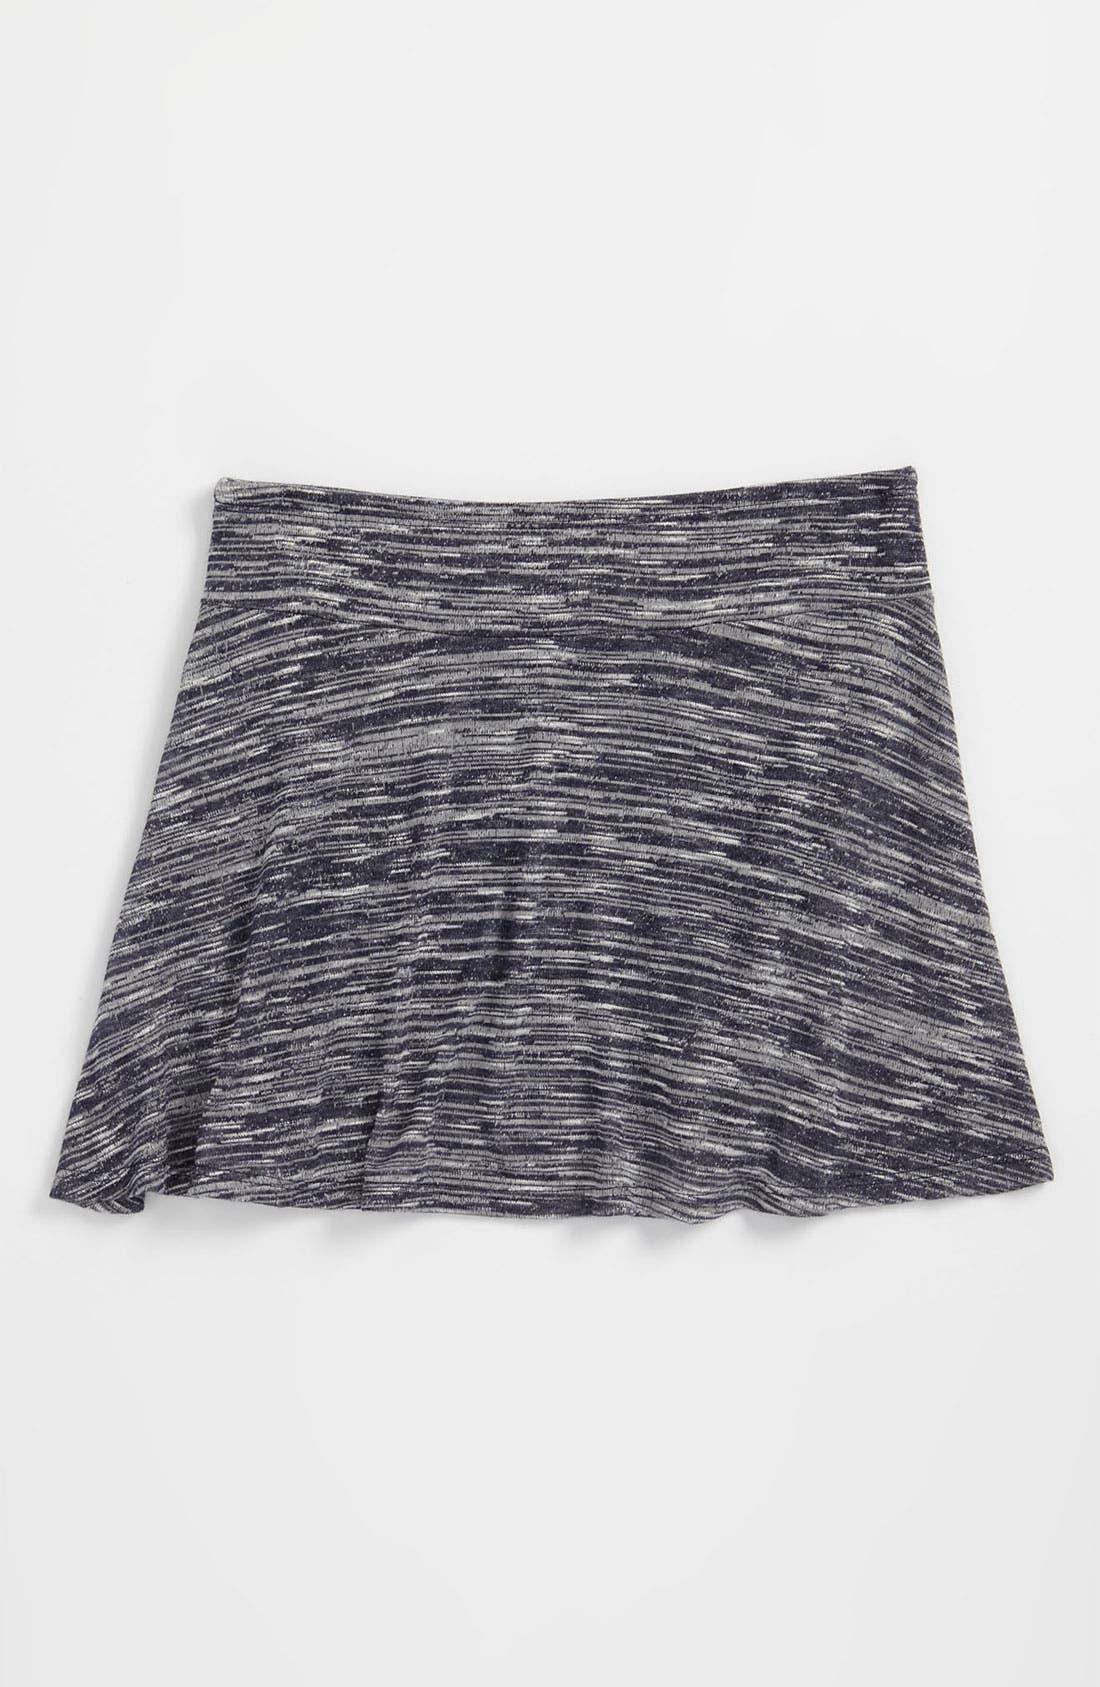 Alternate Image 1 Selected - Zunie Space Dye Skirt (Big Girls)